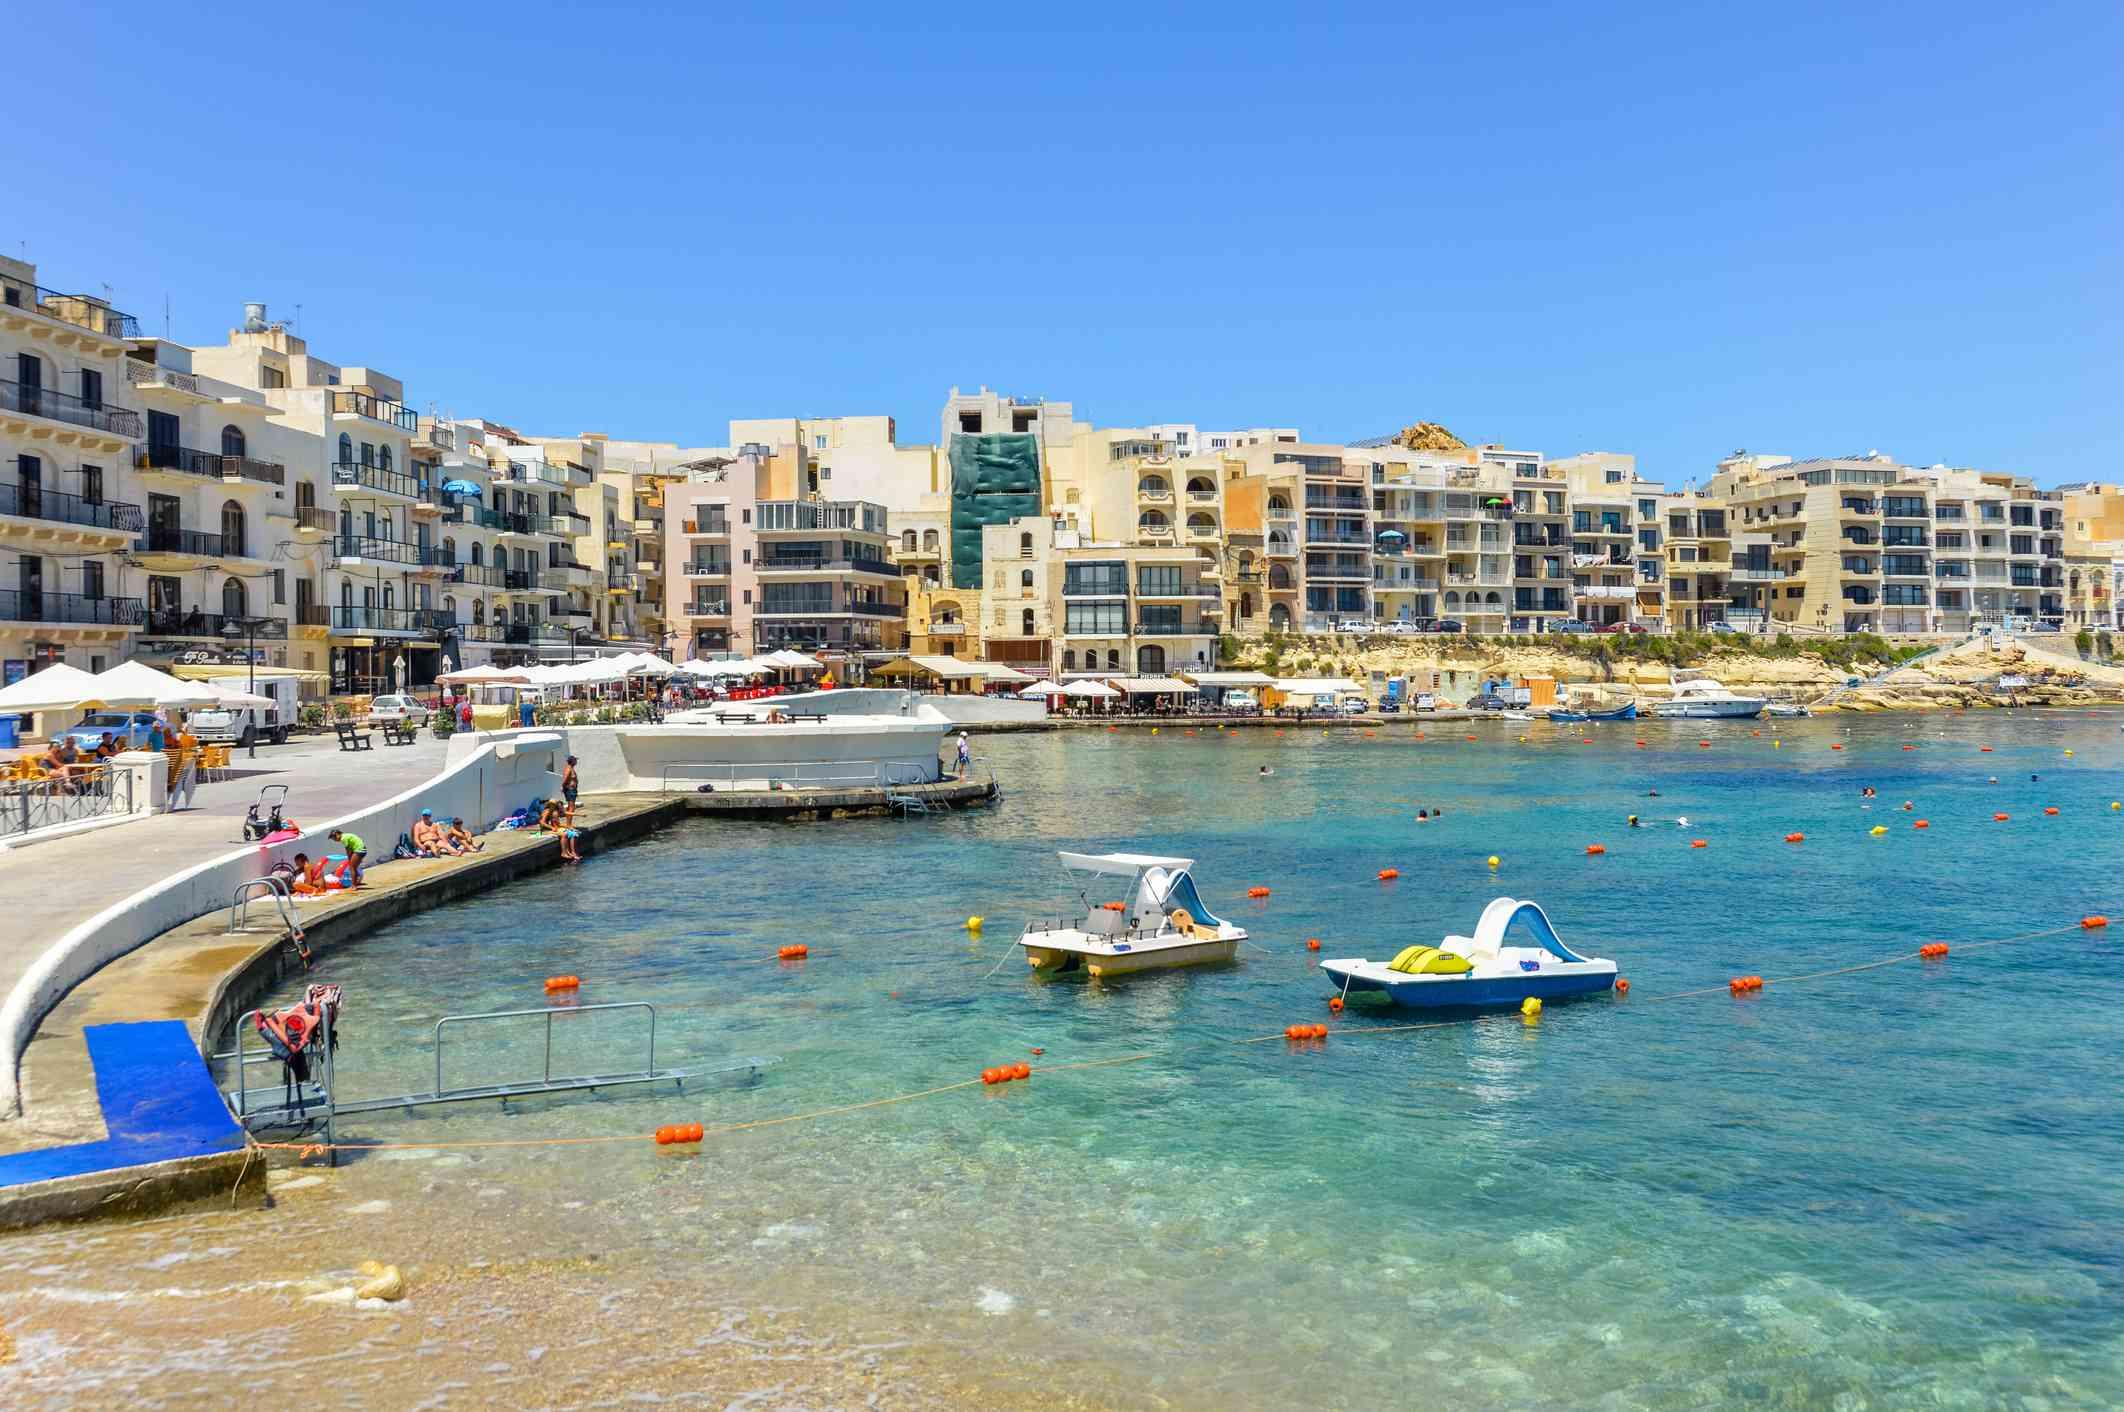 The Maltese resort town of Marsalforn on Gozo Island - Malta